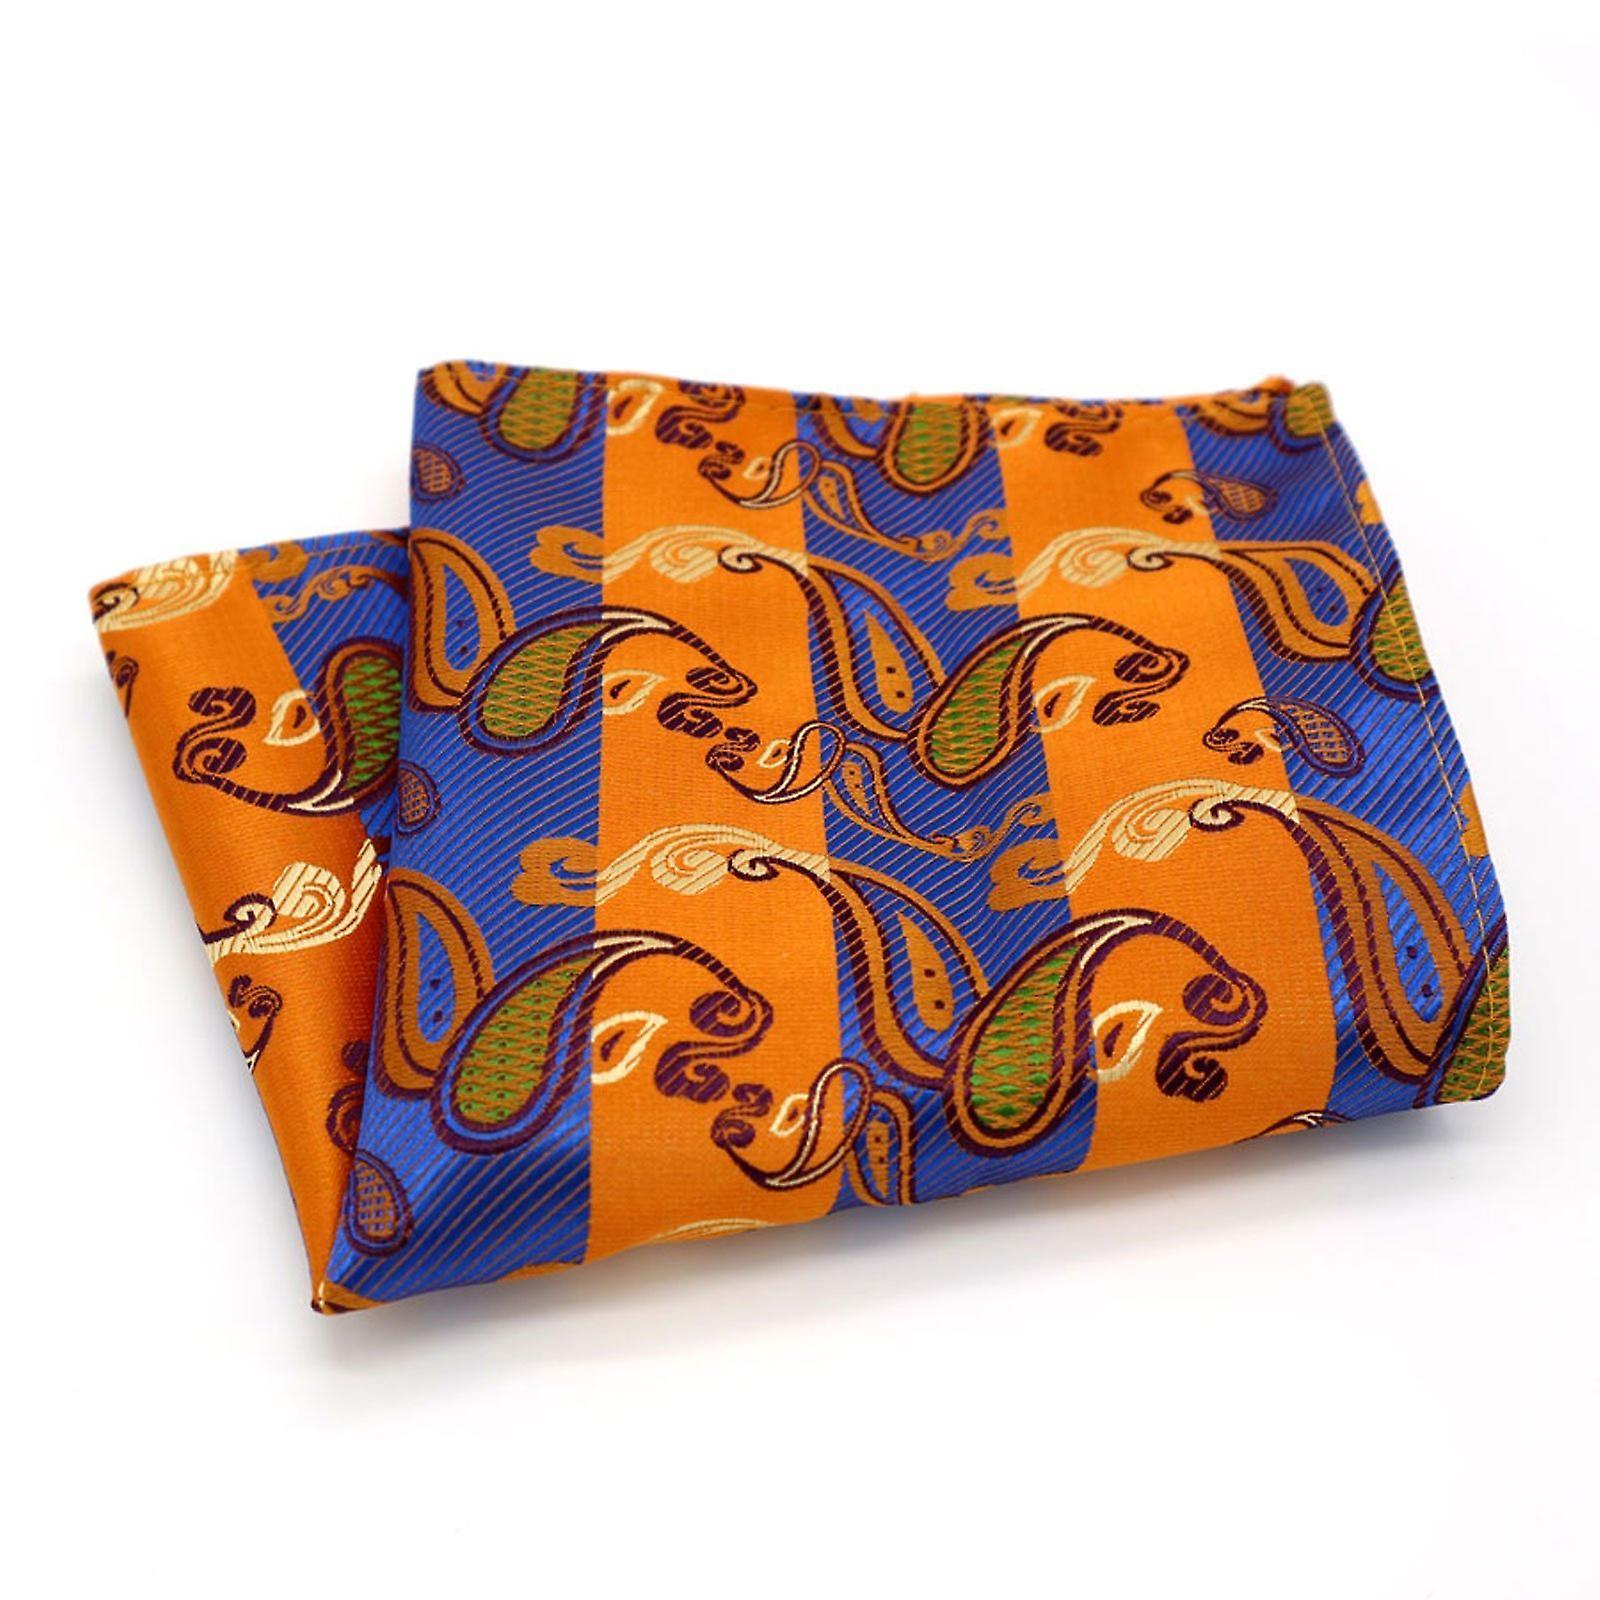 Blue & orange stripe paisley designer pocket square